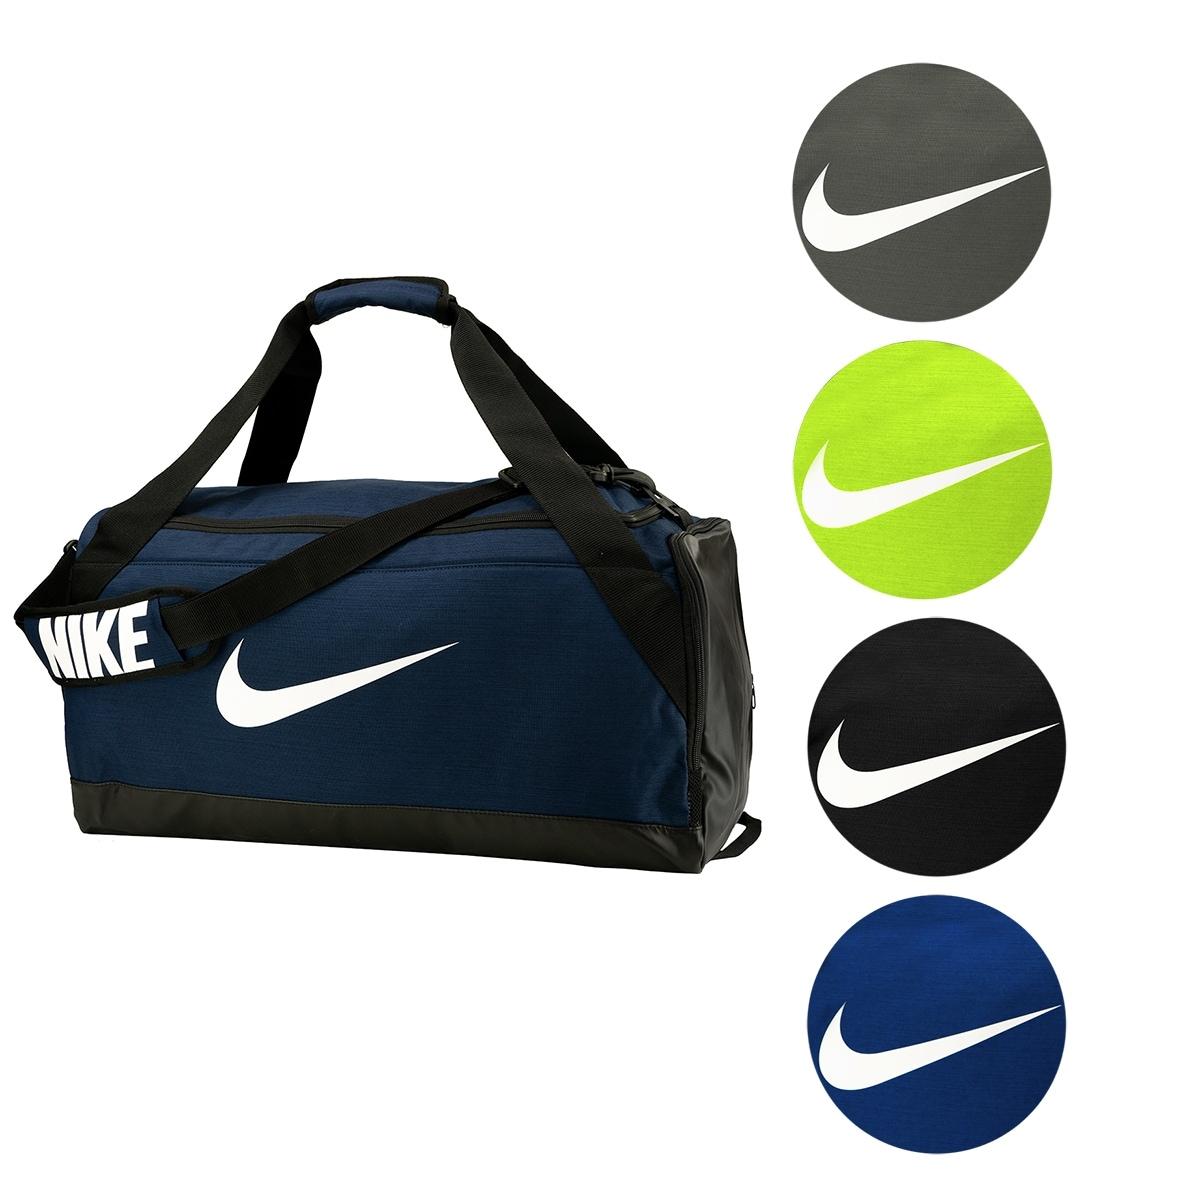 ca041a9590 Shop Nike Brasilia Medium Duffel Bag - Free Shipping On Orders Over  45 -  Overstock - 23622531